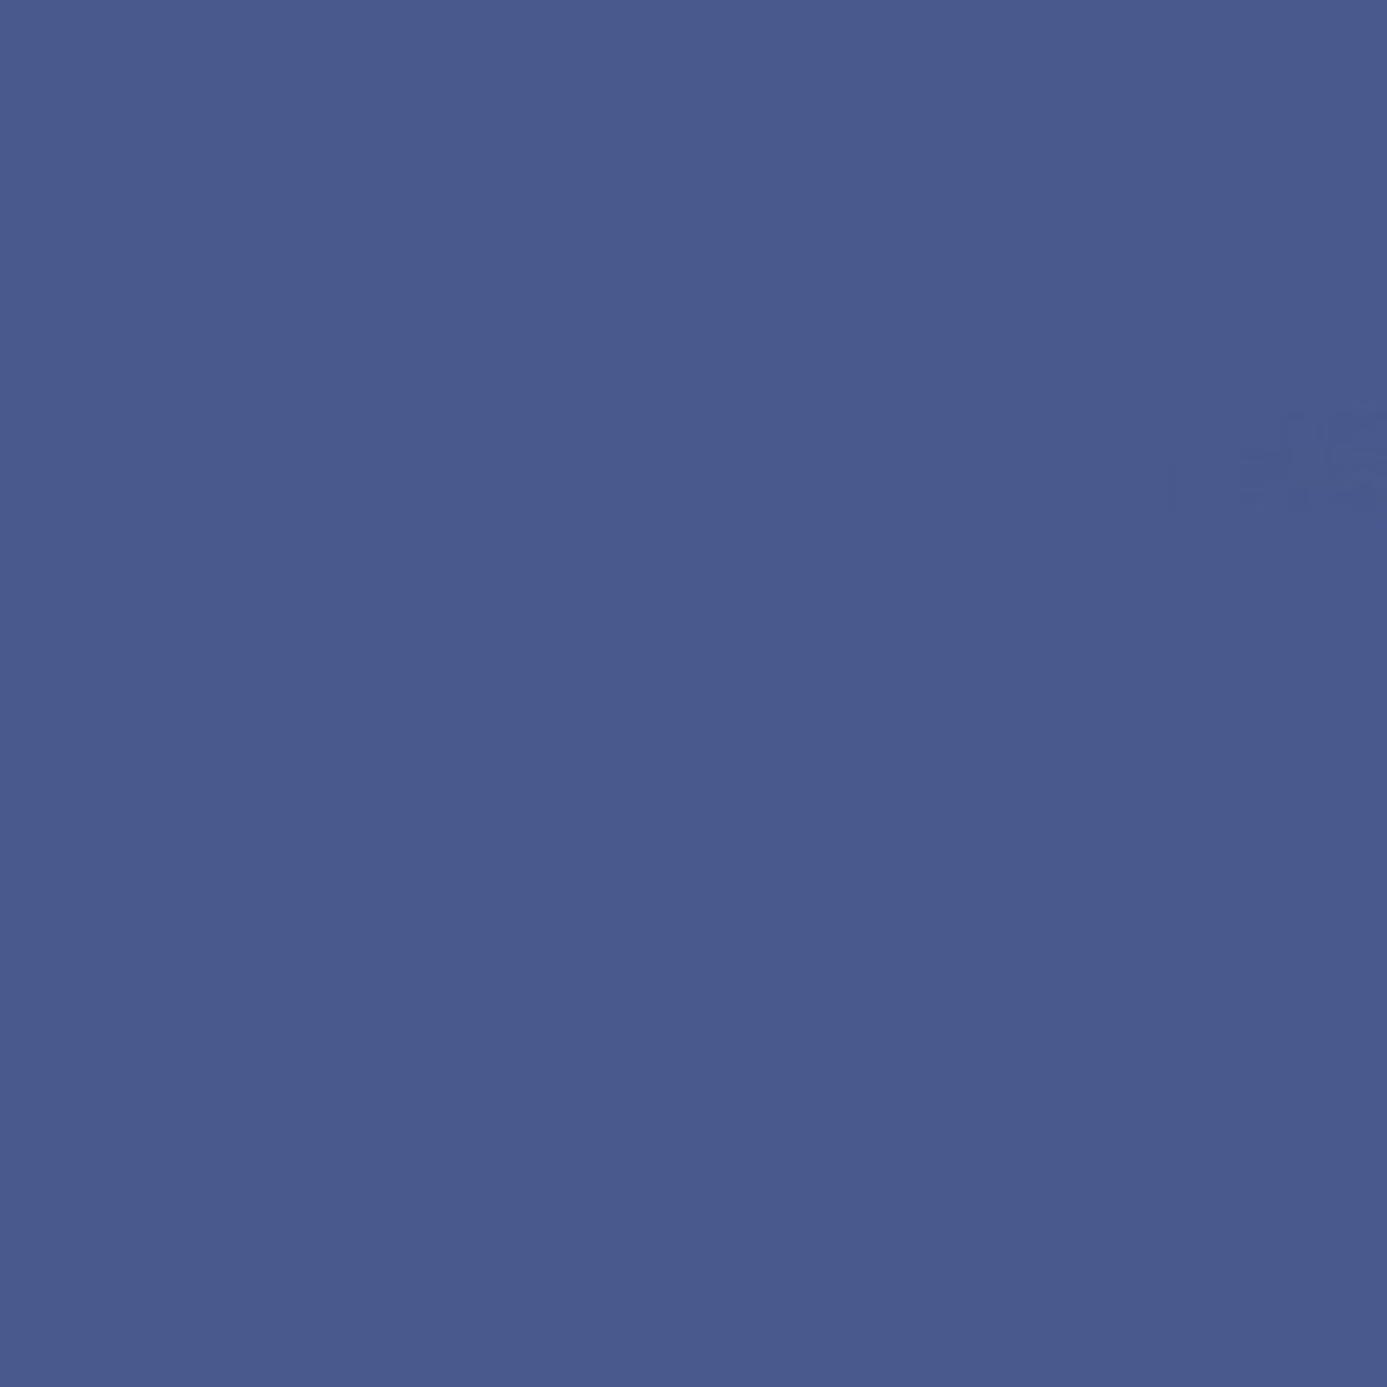 Efco Wax Sheet, Lavender, 200 x 100 x 0.5 mm, 2-Piece